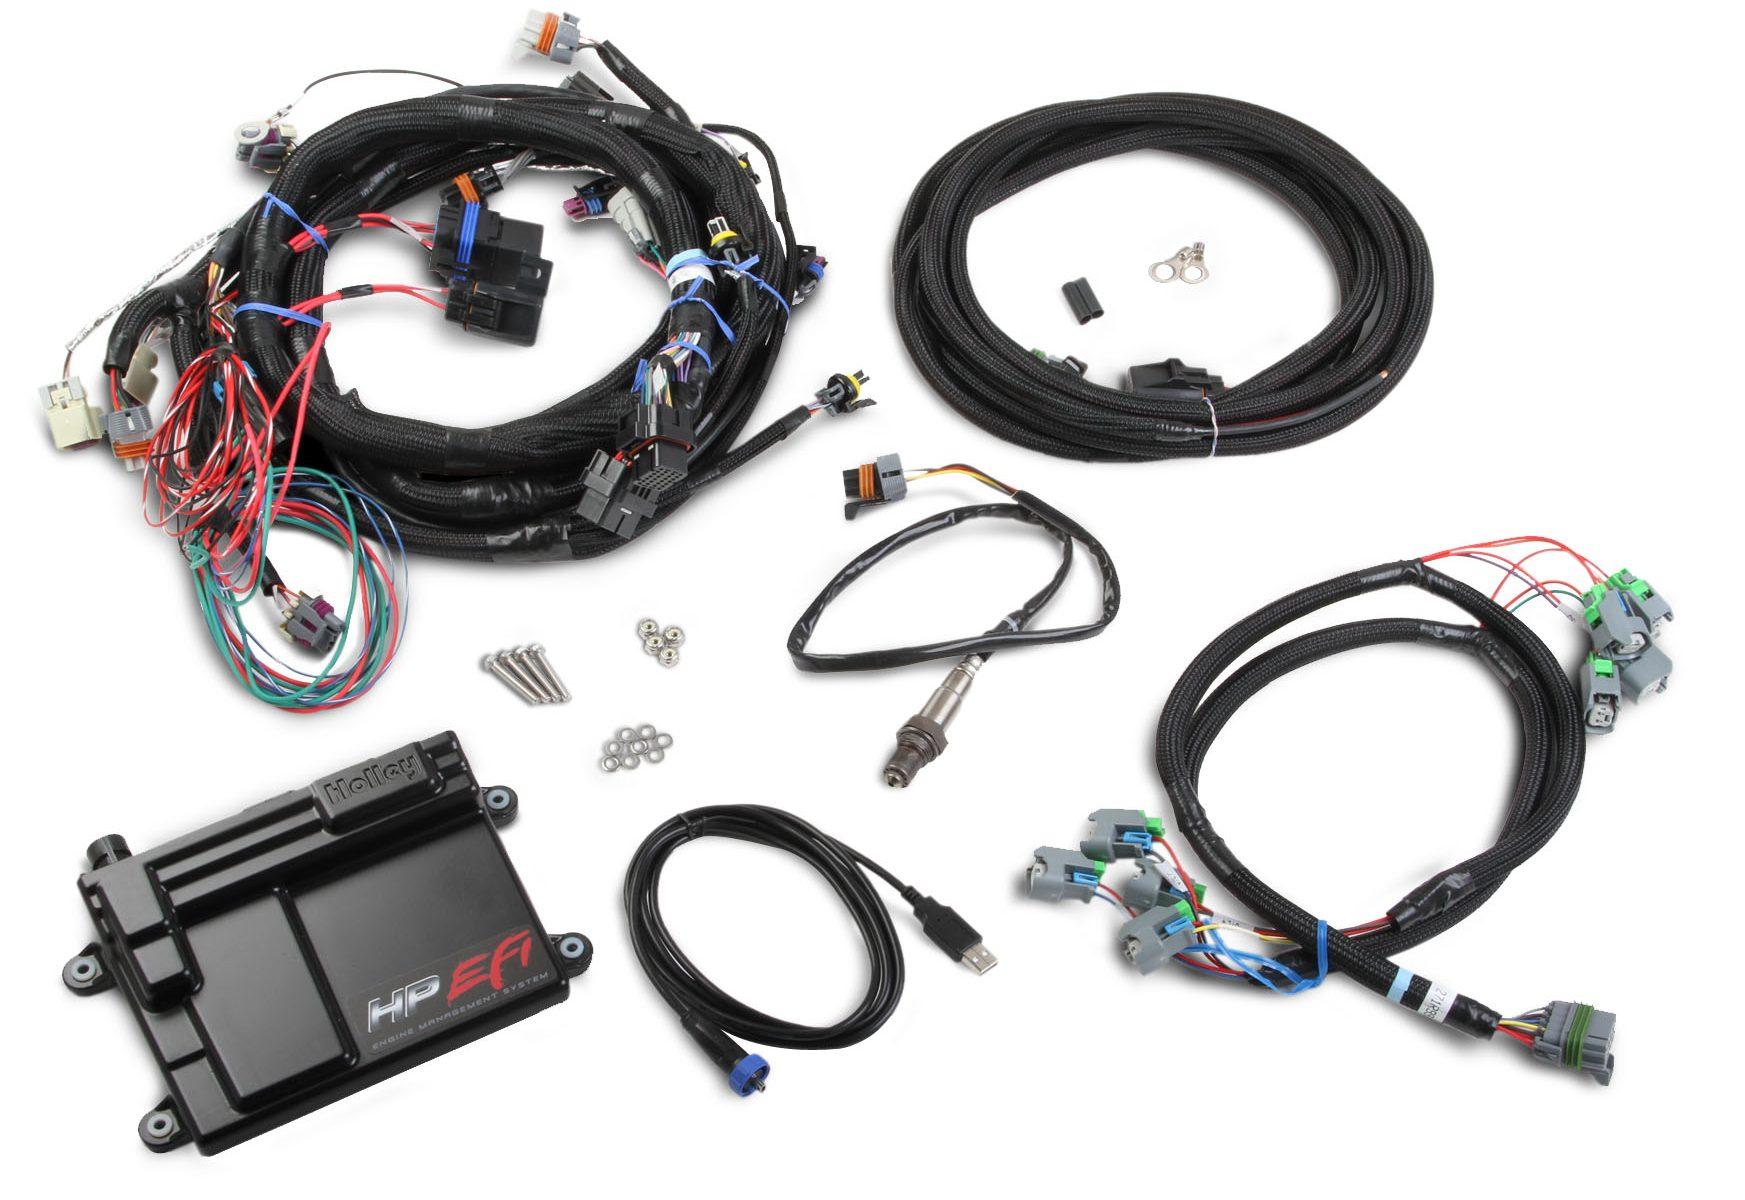 home shop wiring harness holley gm ls2 ls3 ls7 hp efi ecu harness kits [ 1745 x 1200 Pixel ]